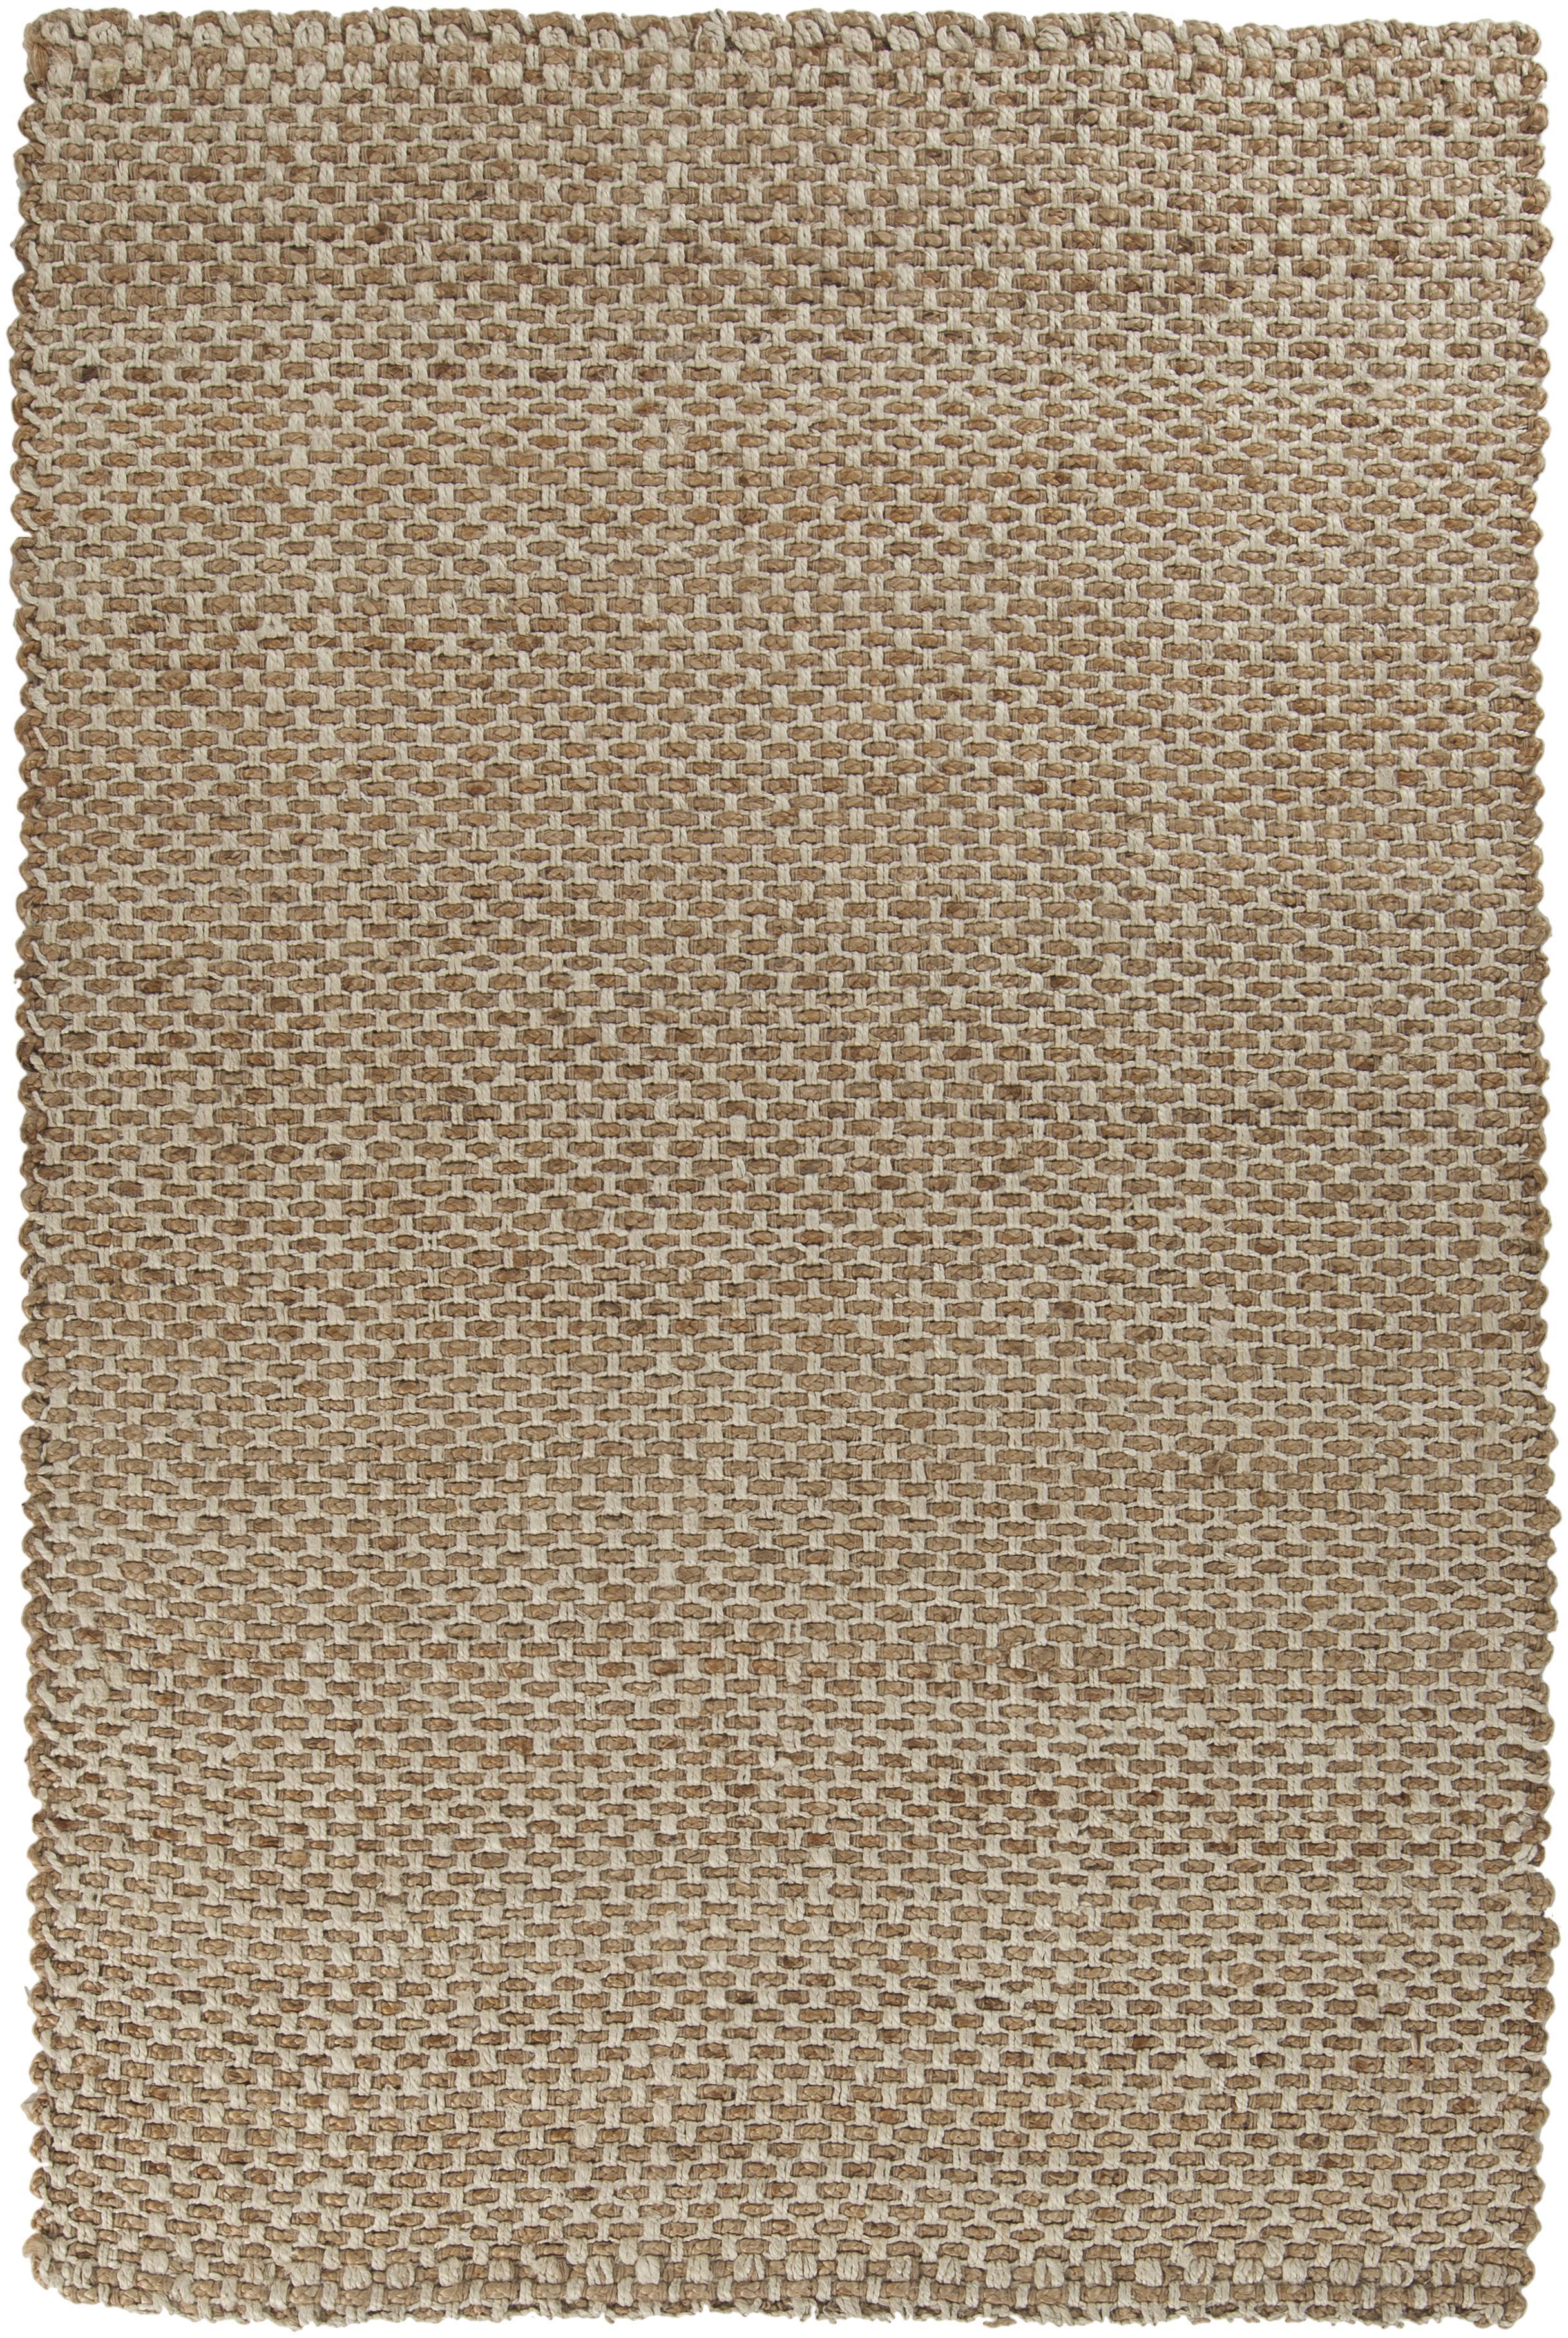 Surya Reeds 10' x 14' - Item Number: REED824-1014